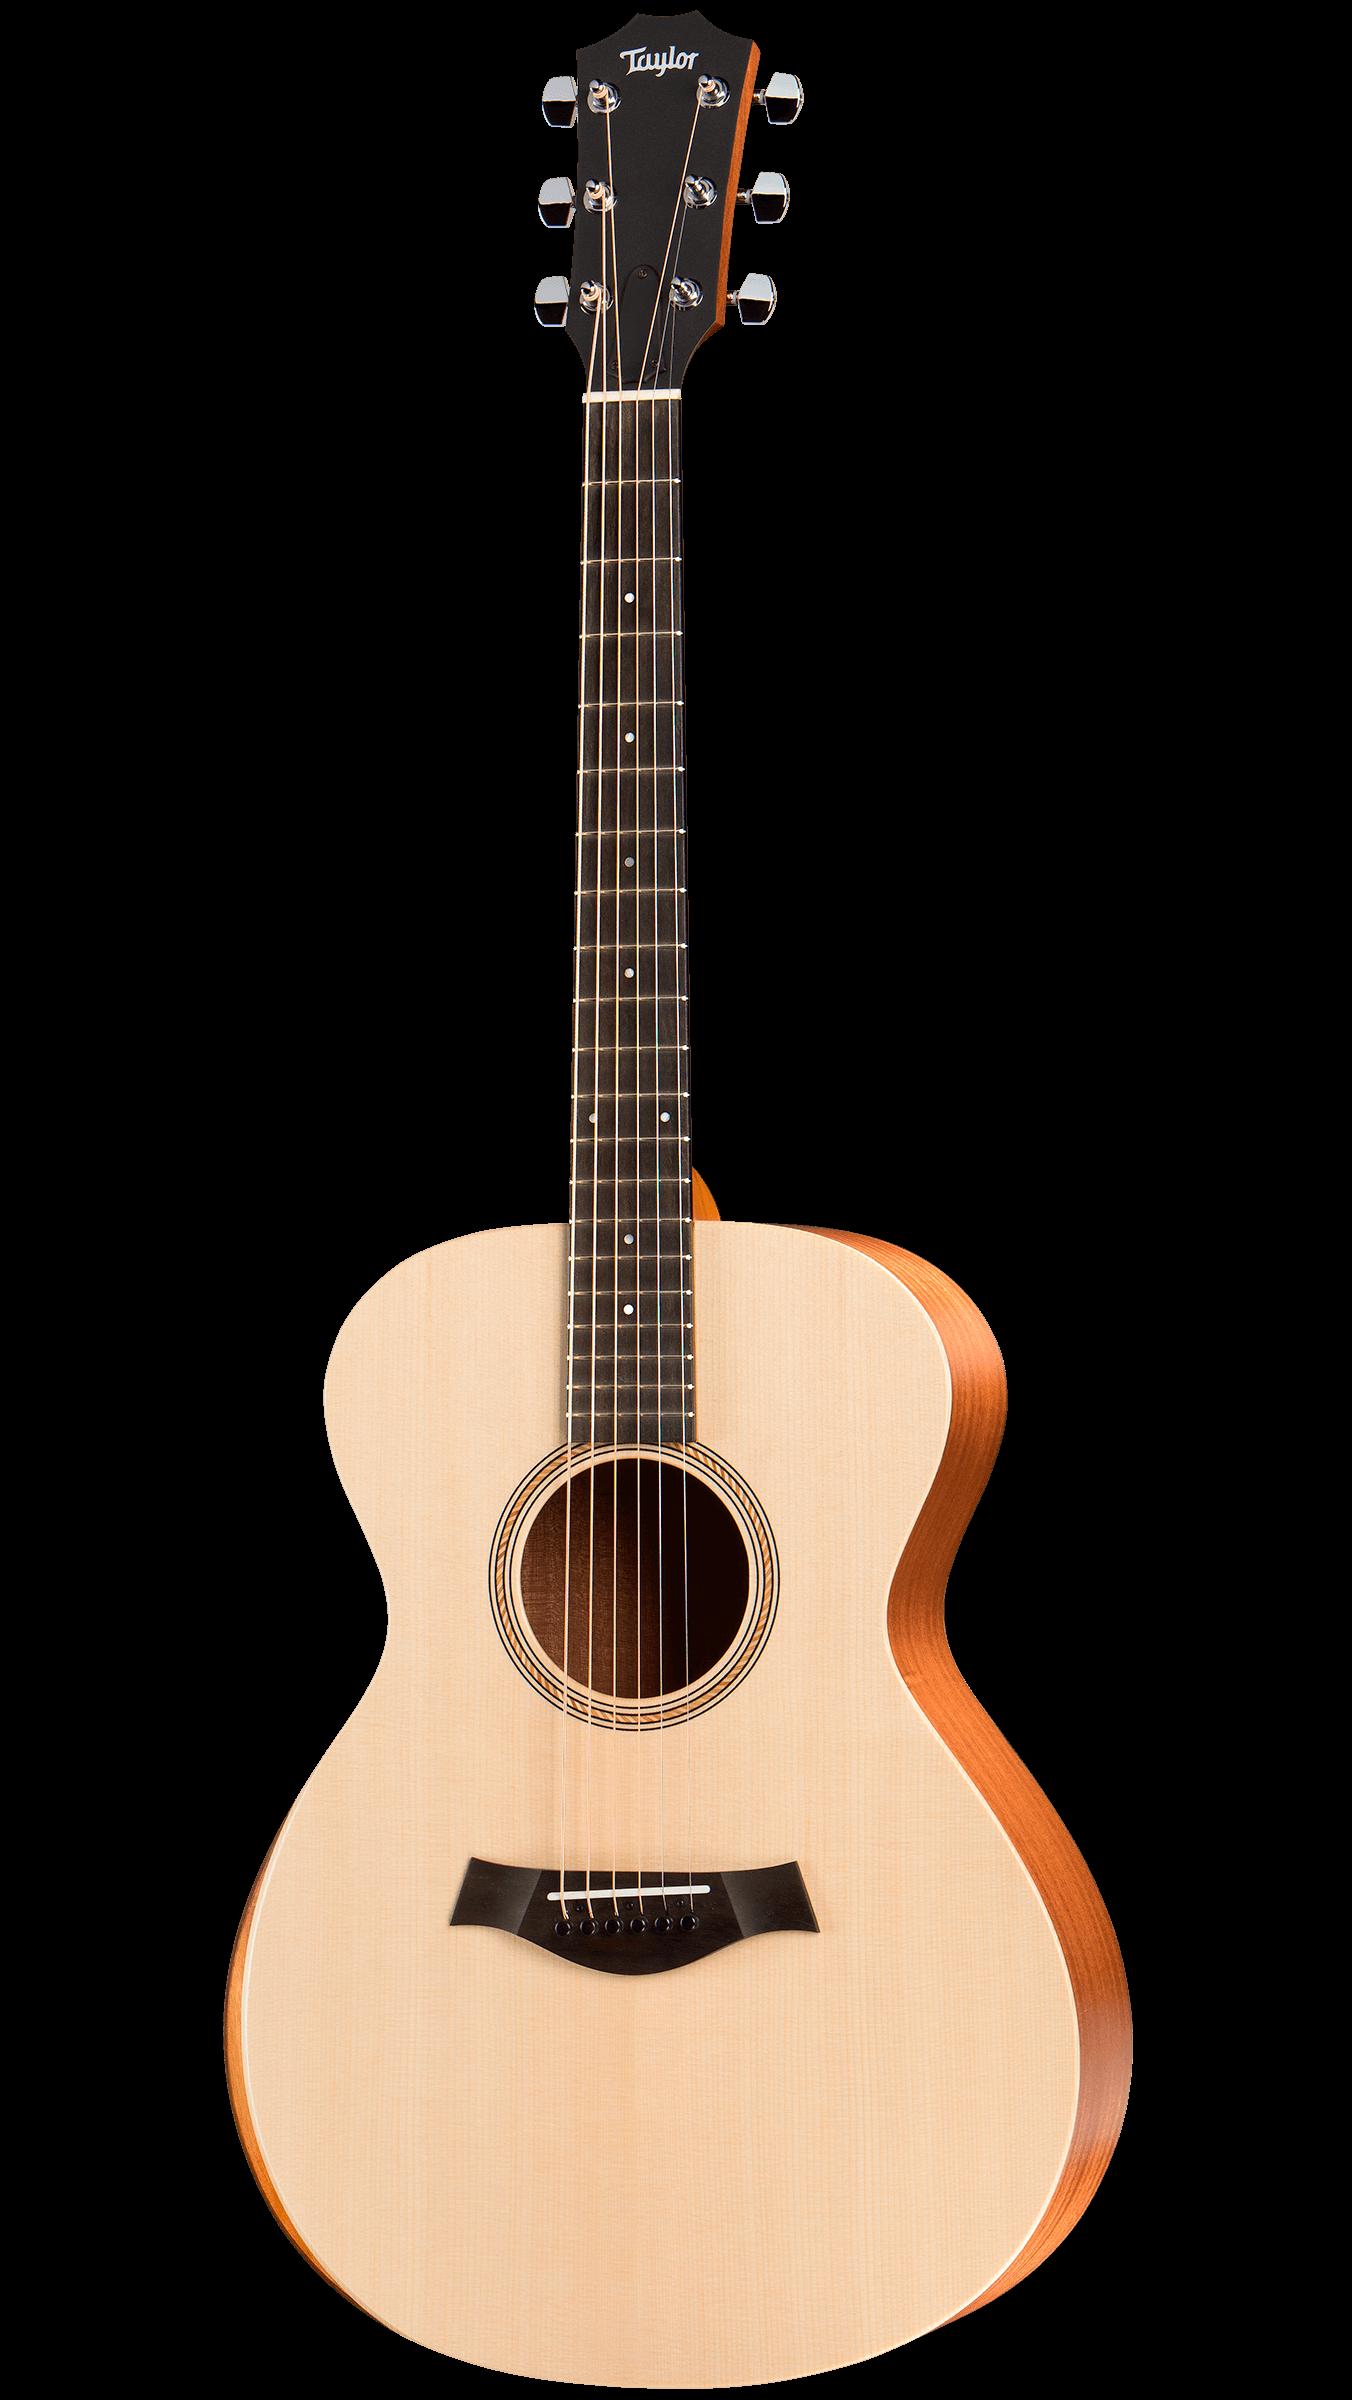 Taylor Academy A12e Grand Concert With Electronics And Gig Bag Ovation Guitar Acoustic Electric Guitar Yamaha Guitar